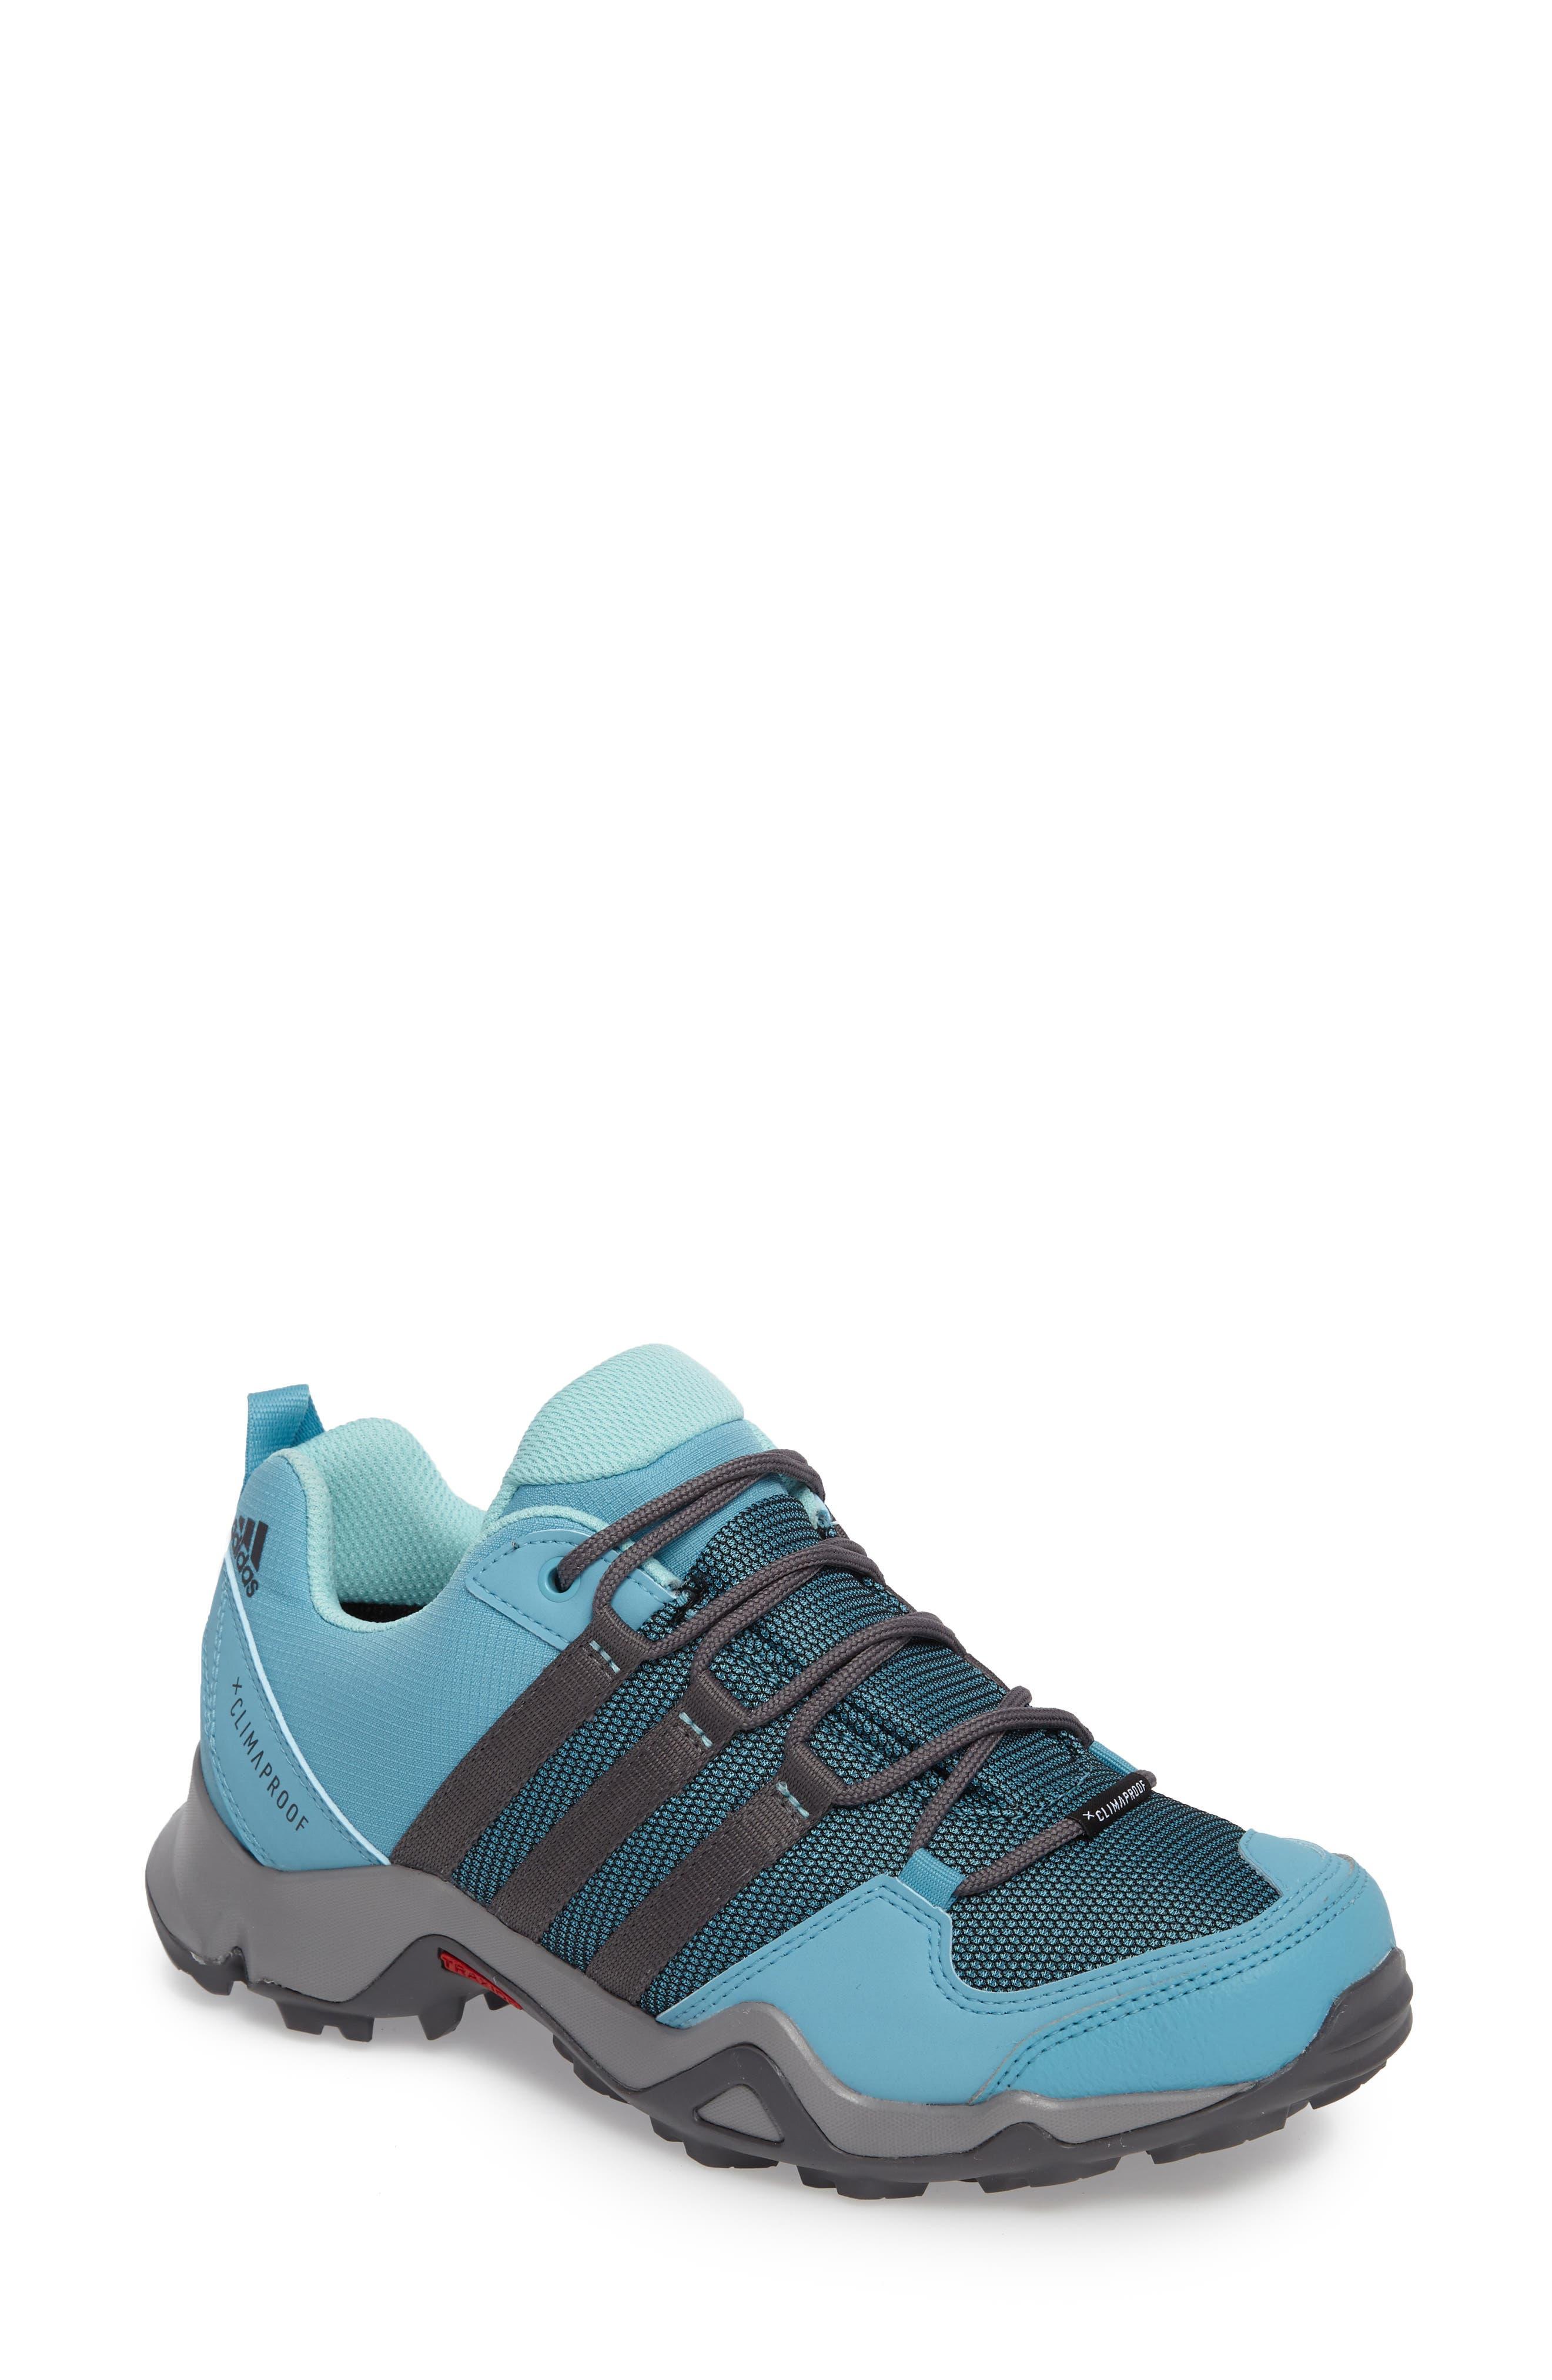 'AX2' Waterproof Hiking Shoe,                             Main thumbnail 1, color,                             400